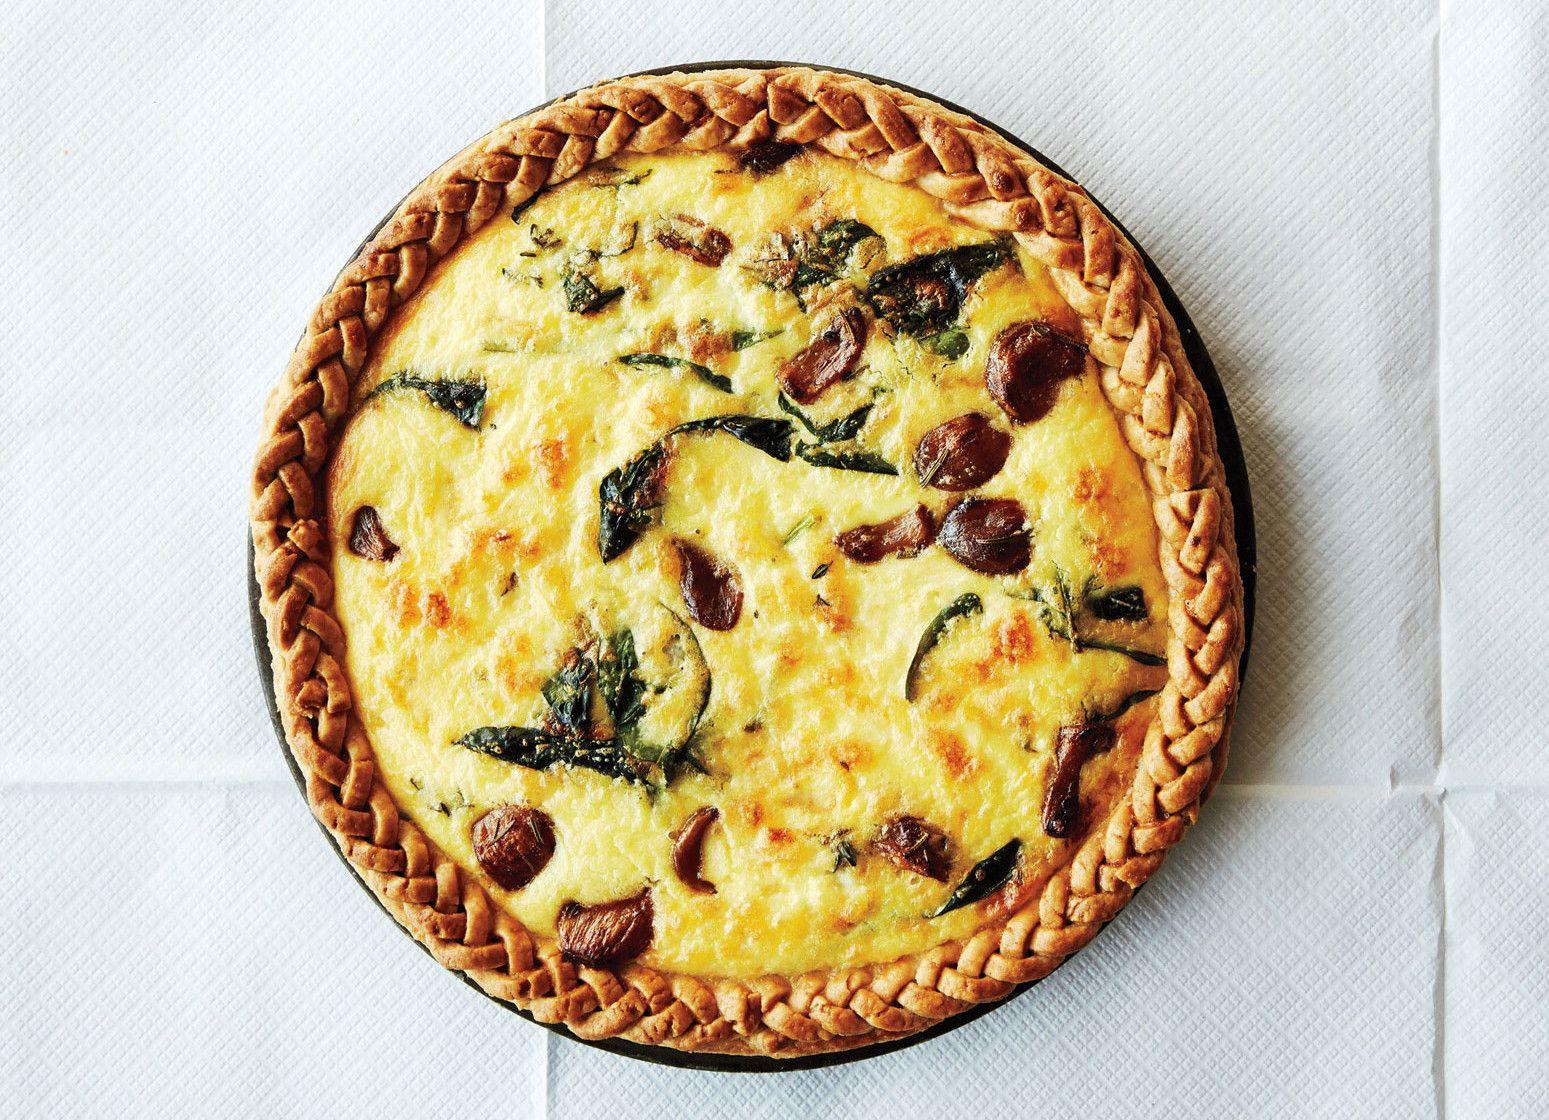 Caramelized Garlic Spinach And Cheddar Tart